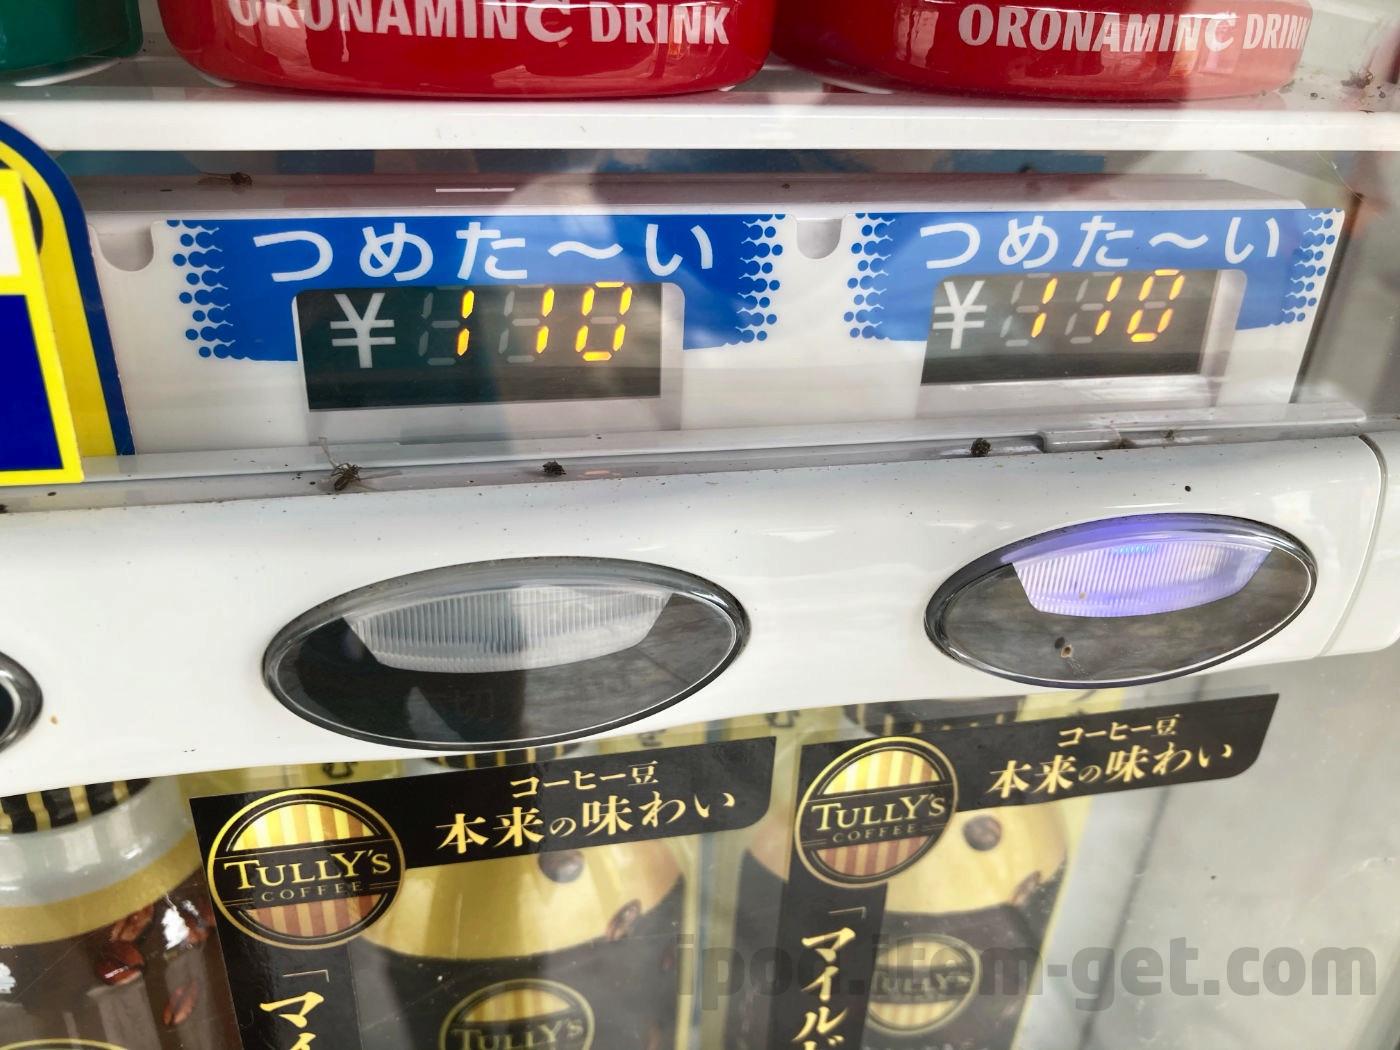 QRcode jihanki vendingmachine 04